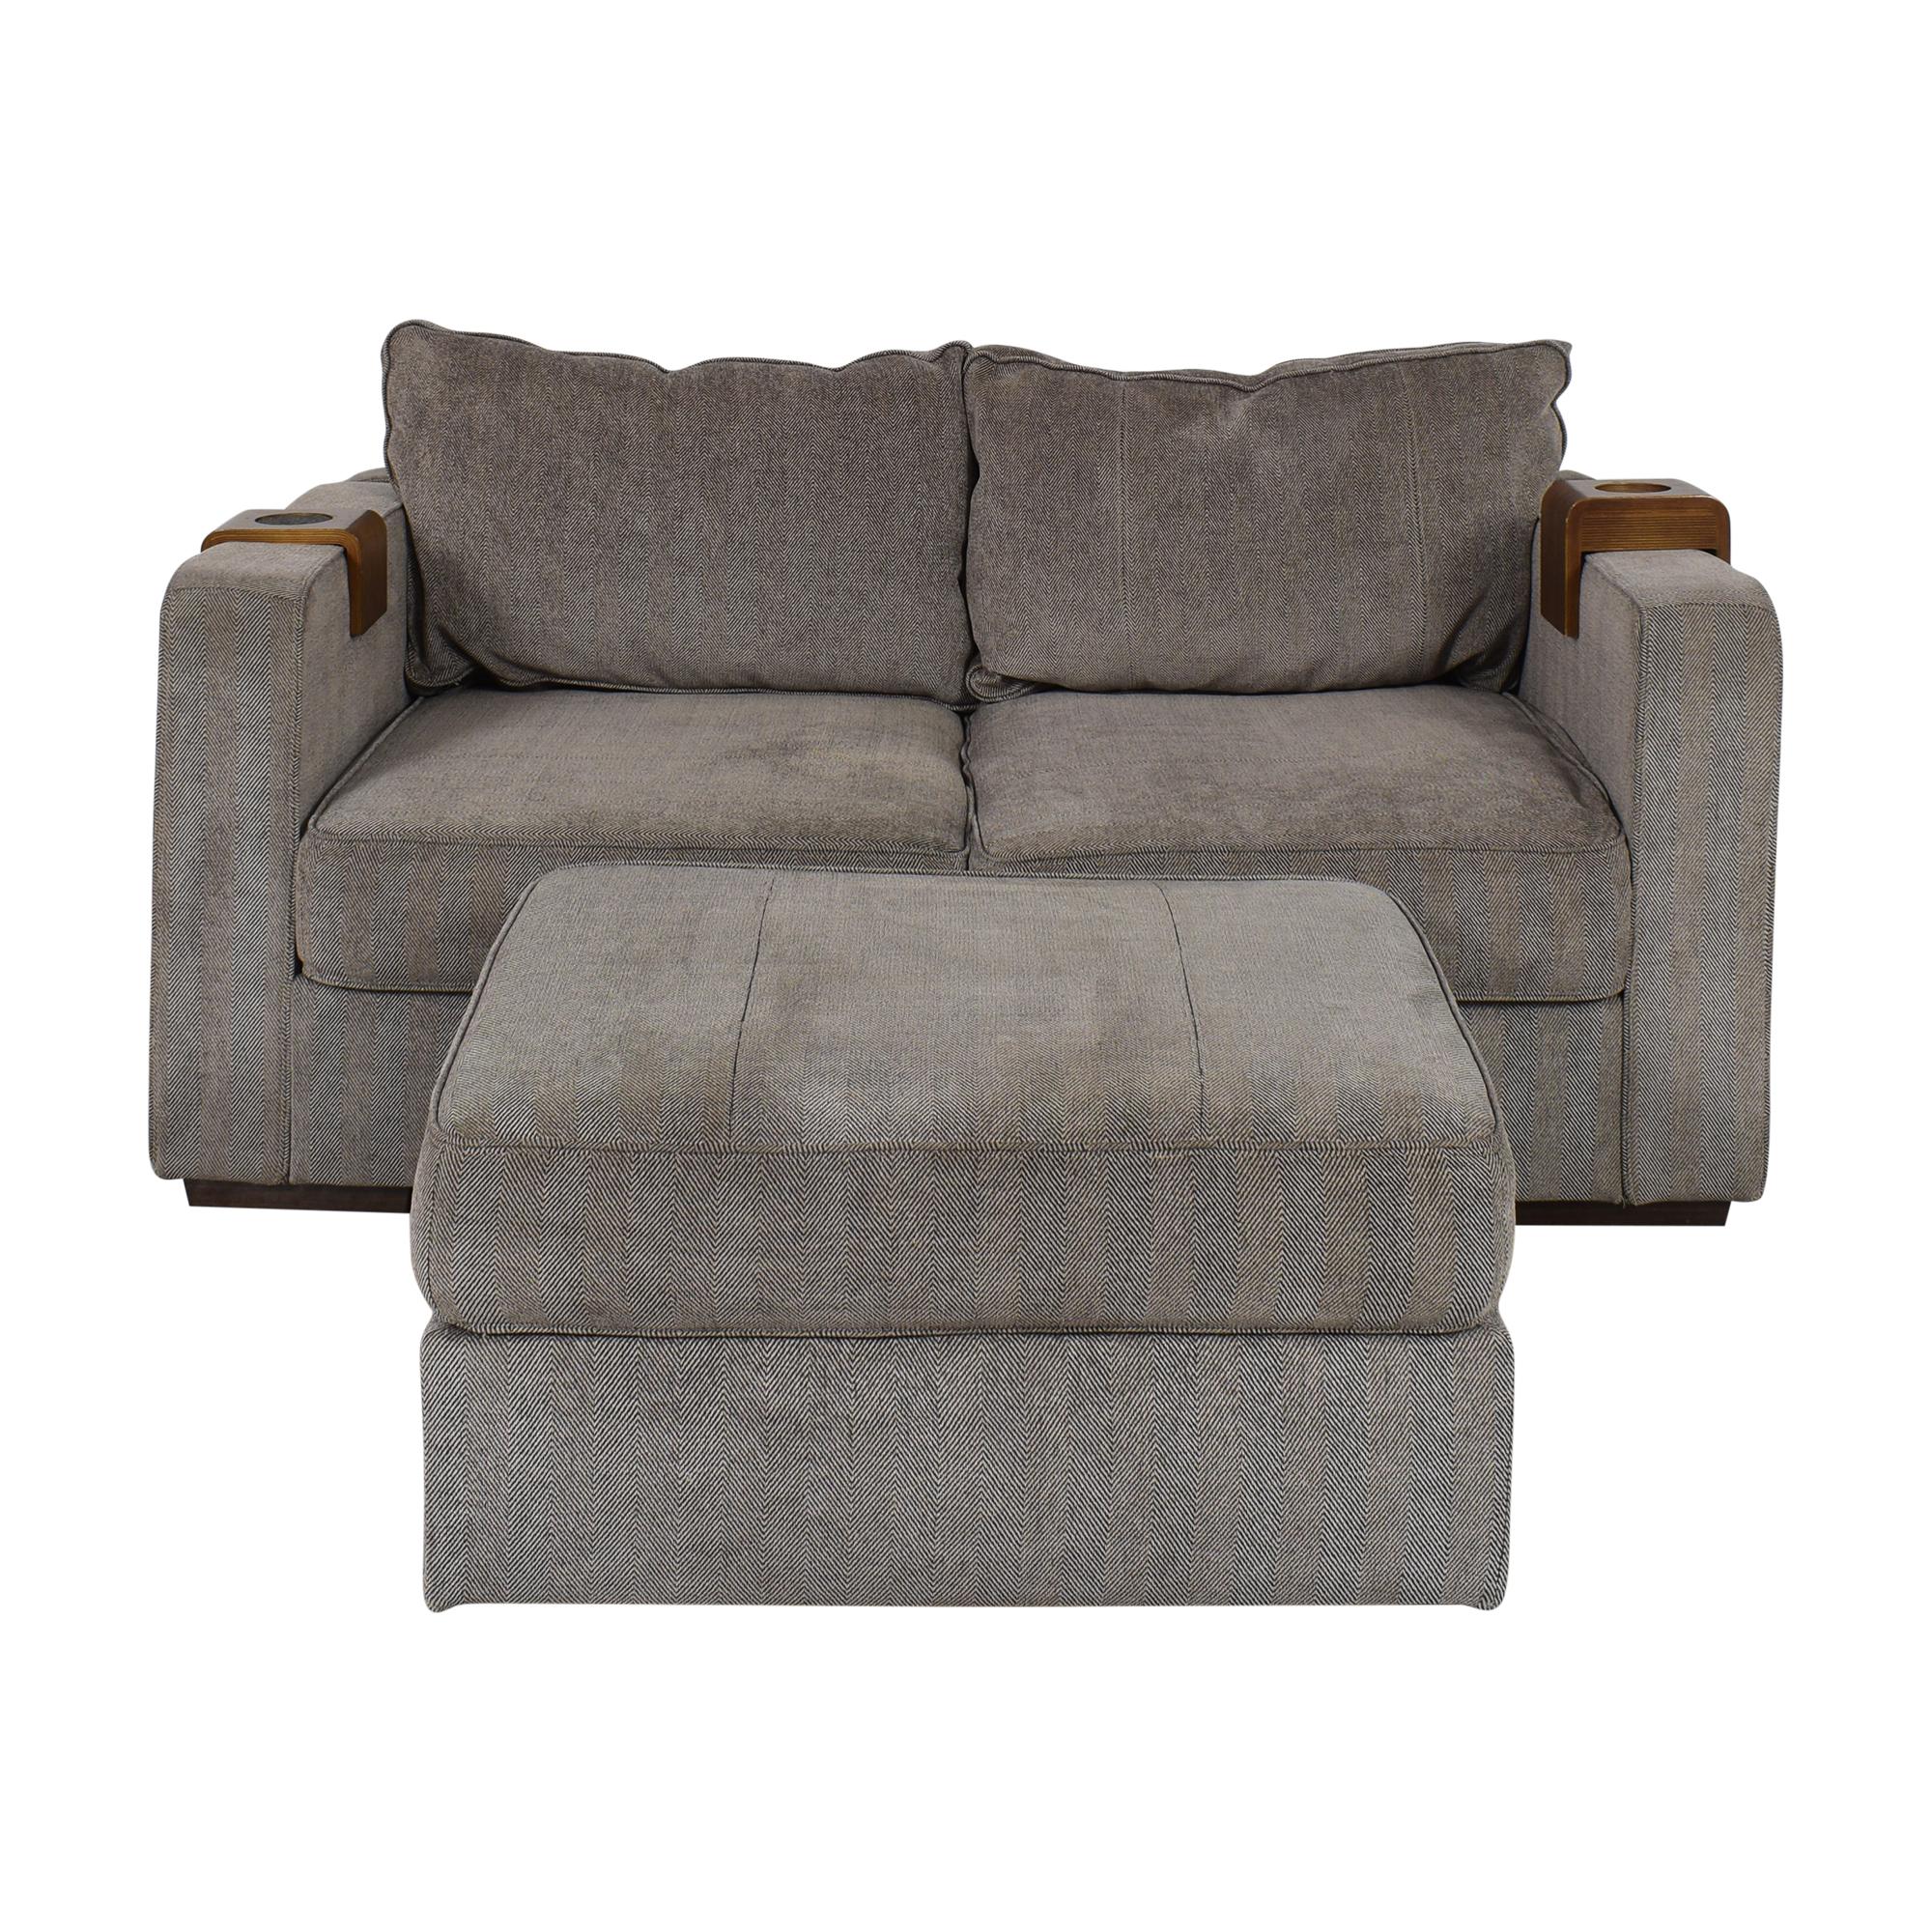 Lovesac Lovesac Sactional Sofa with Ottoman and Cupholder ma